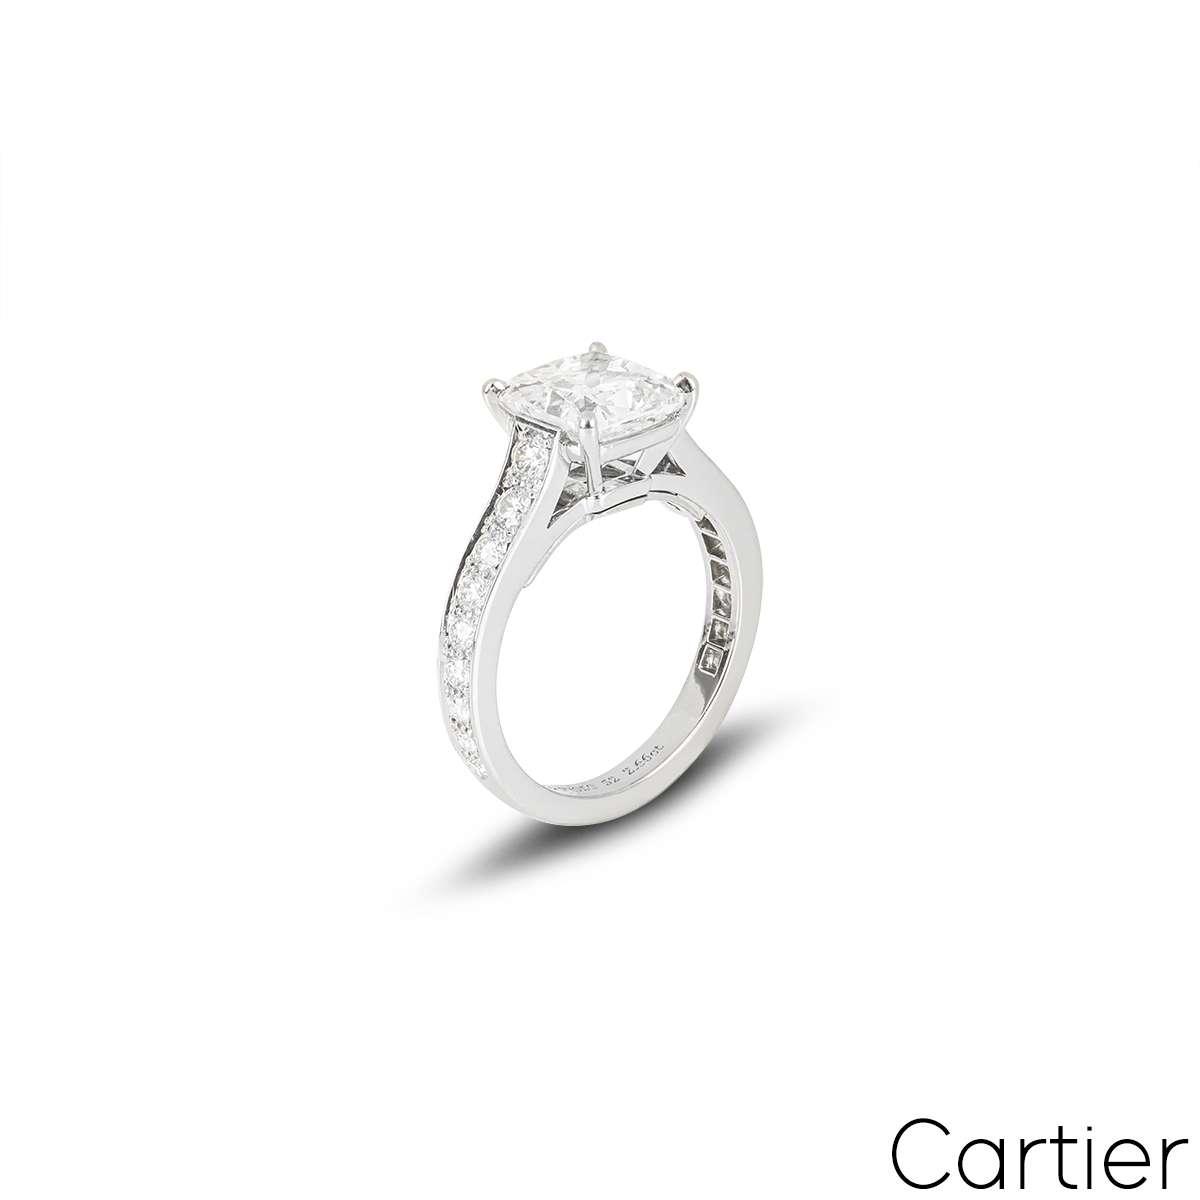 Cartier Platinum Diamond 1895 Solitaire Ring 2.66ct E/VS1